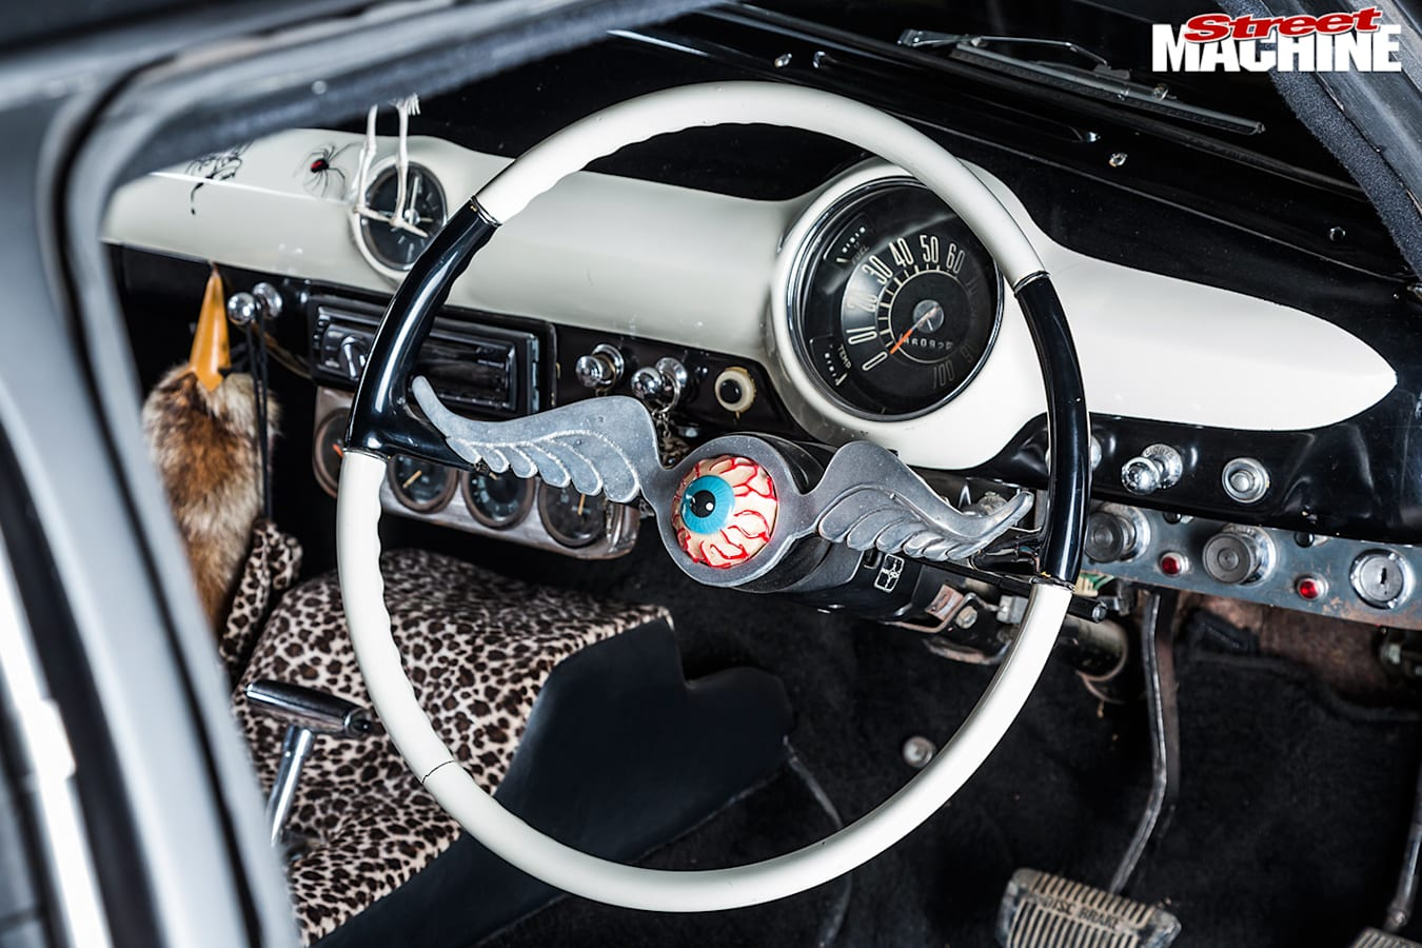 Ford Spinner dash